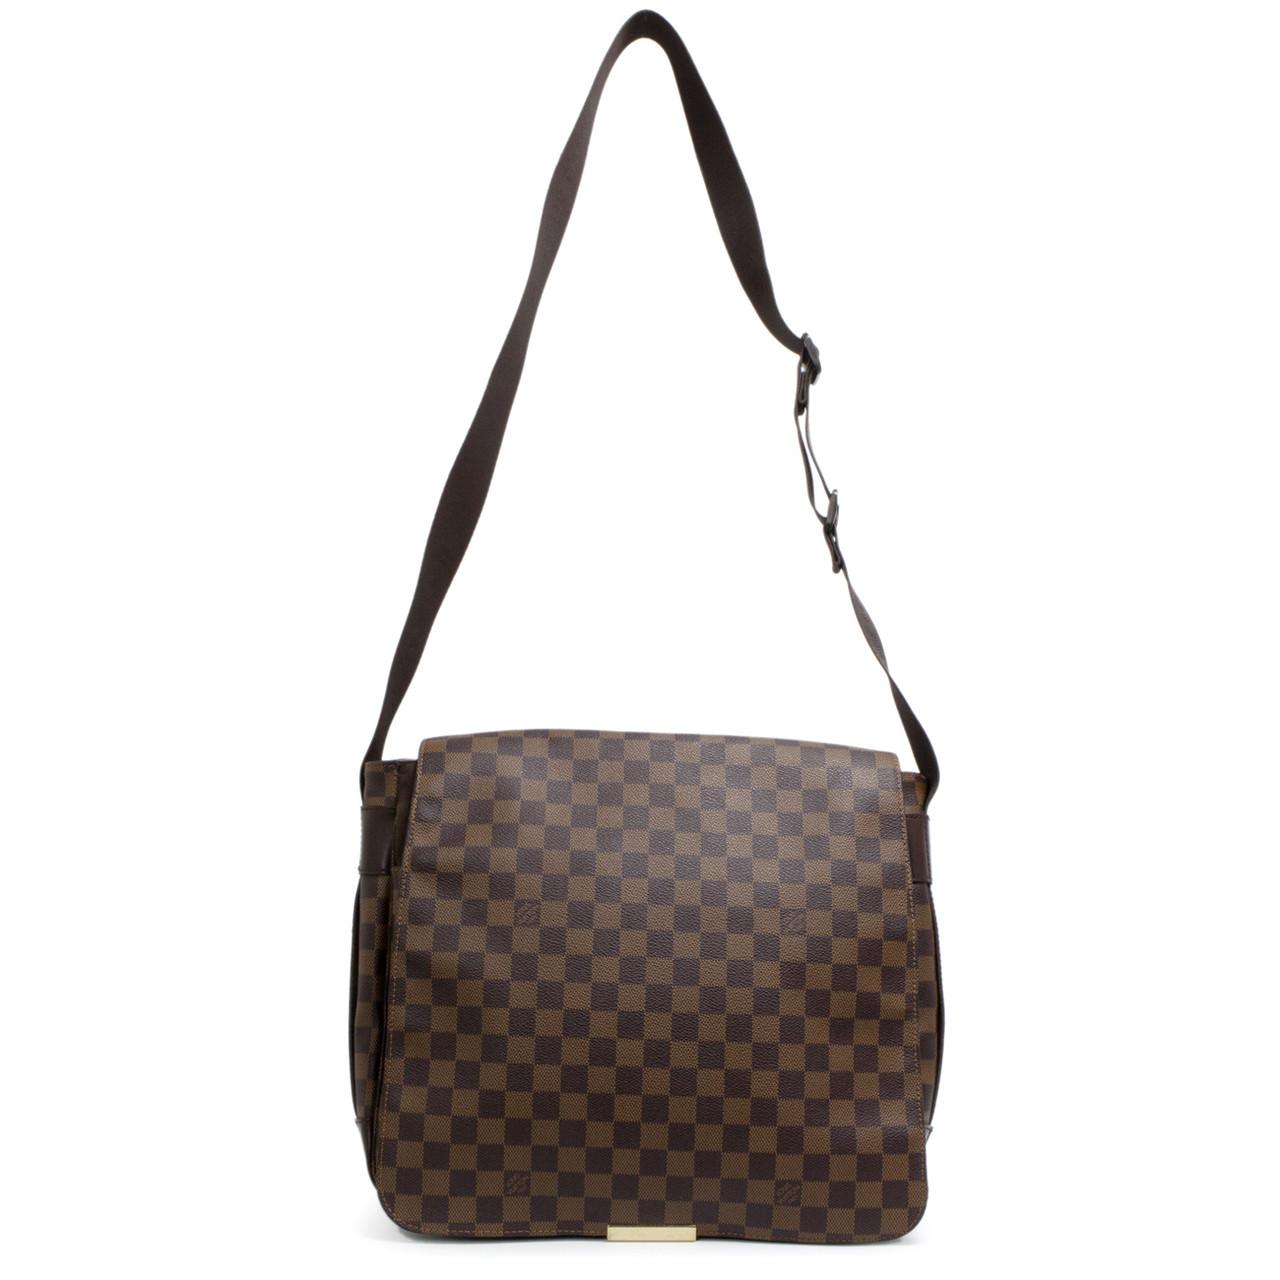 89bb99fb42ef Louis Vuitton Damier Ebene Bastille Messenger Bag - modaselle